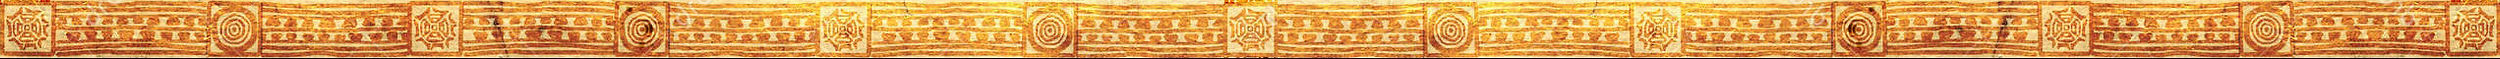 american-indian-traditionalBARx2.jpg